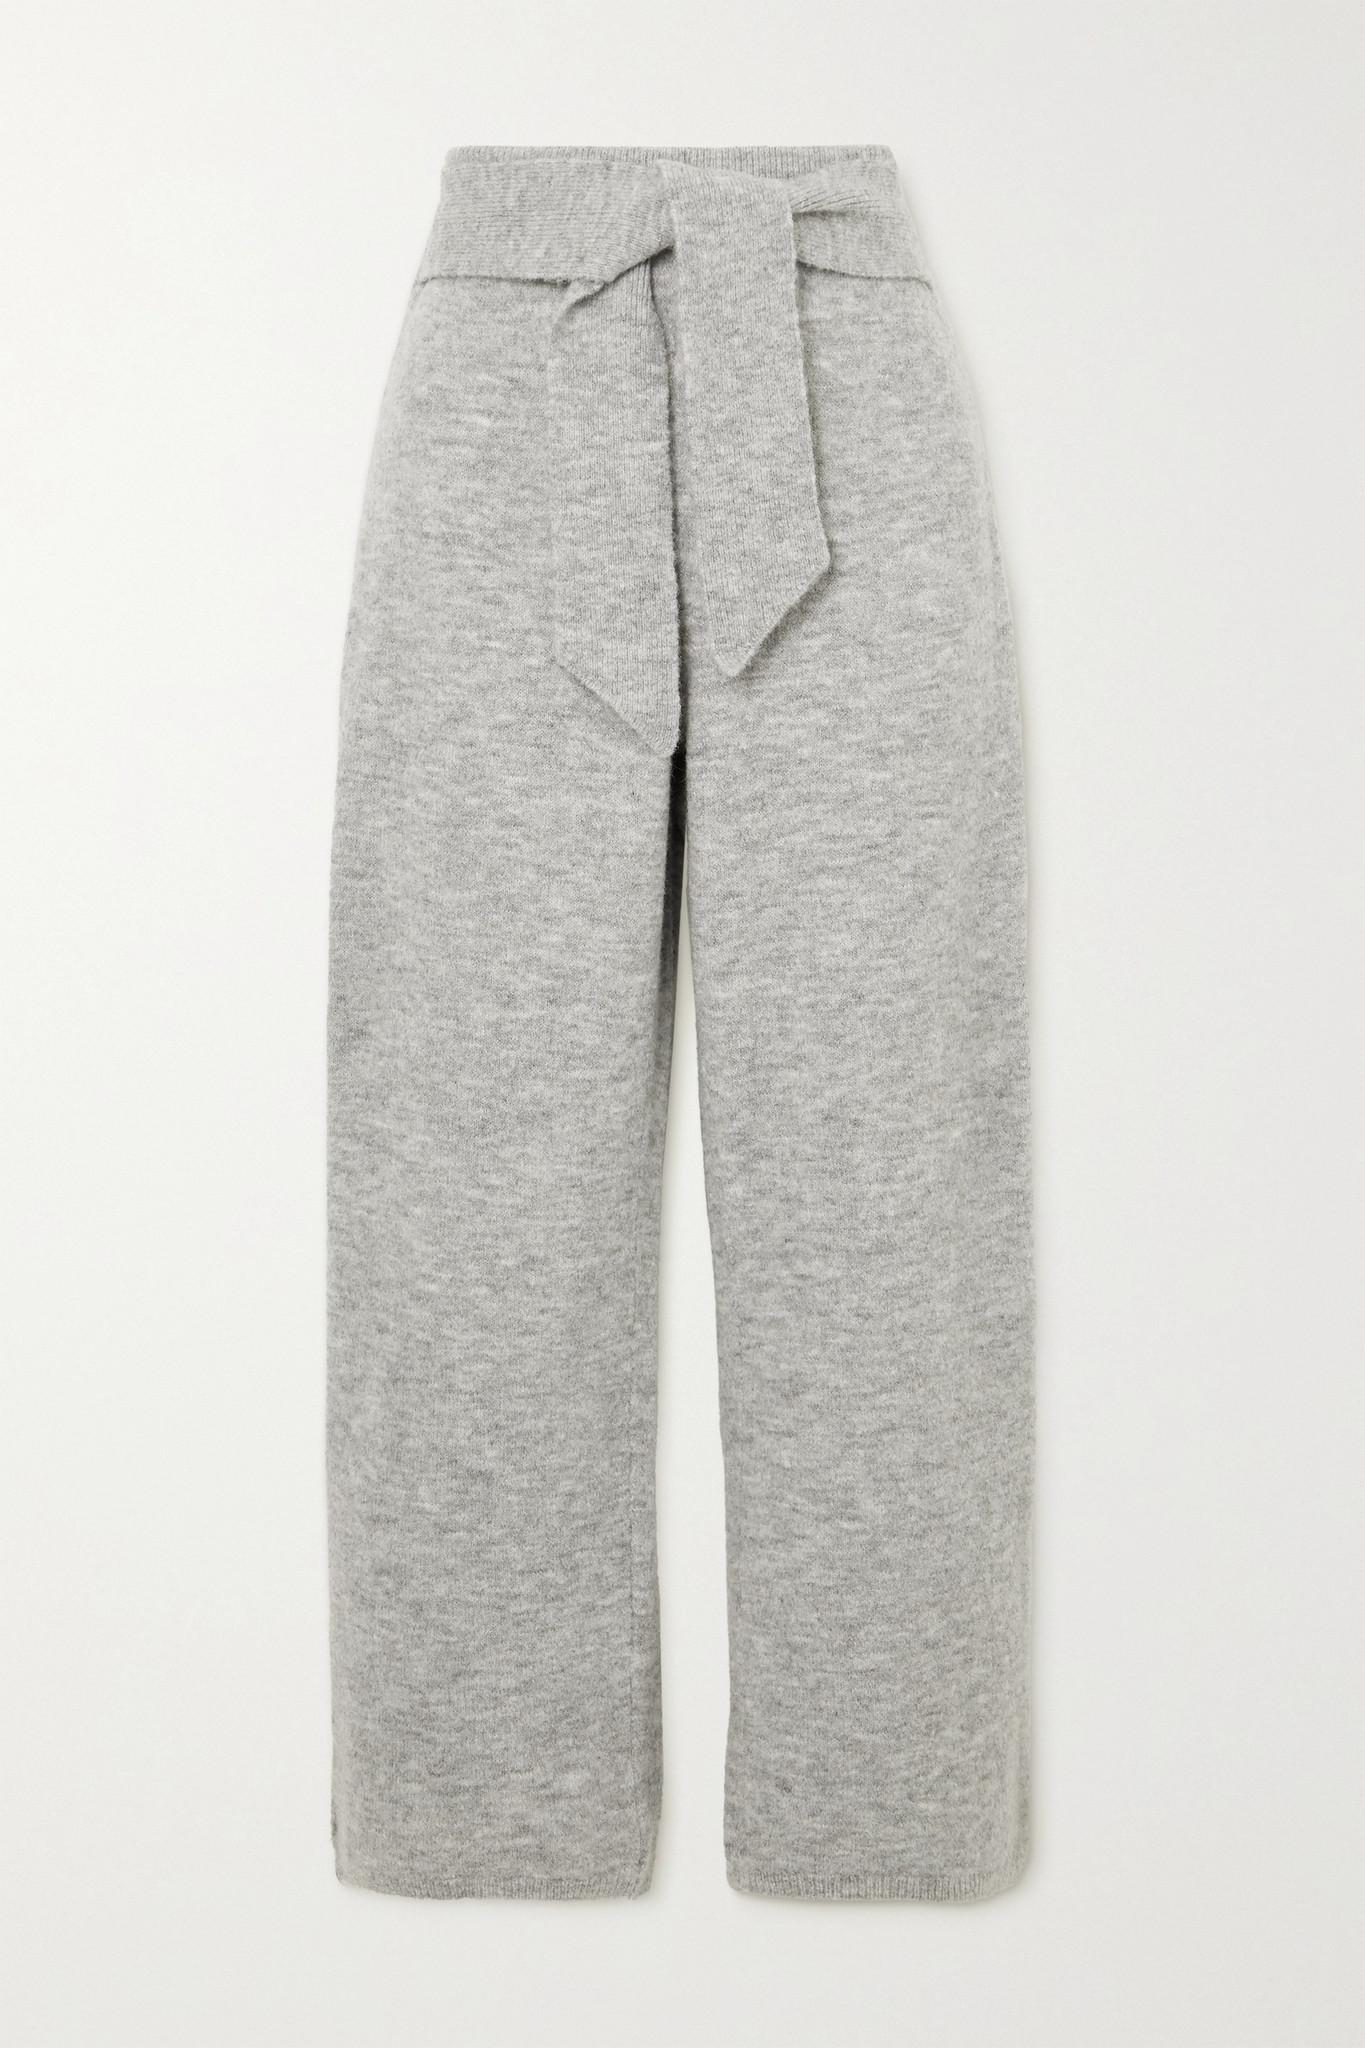 NANUSHKA - Nea Belted Ribbed Mélange Knitted Pants - Gray - small